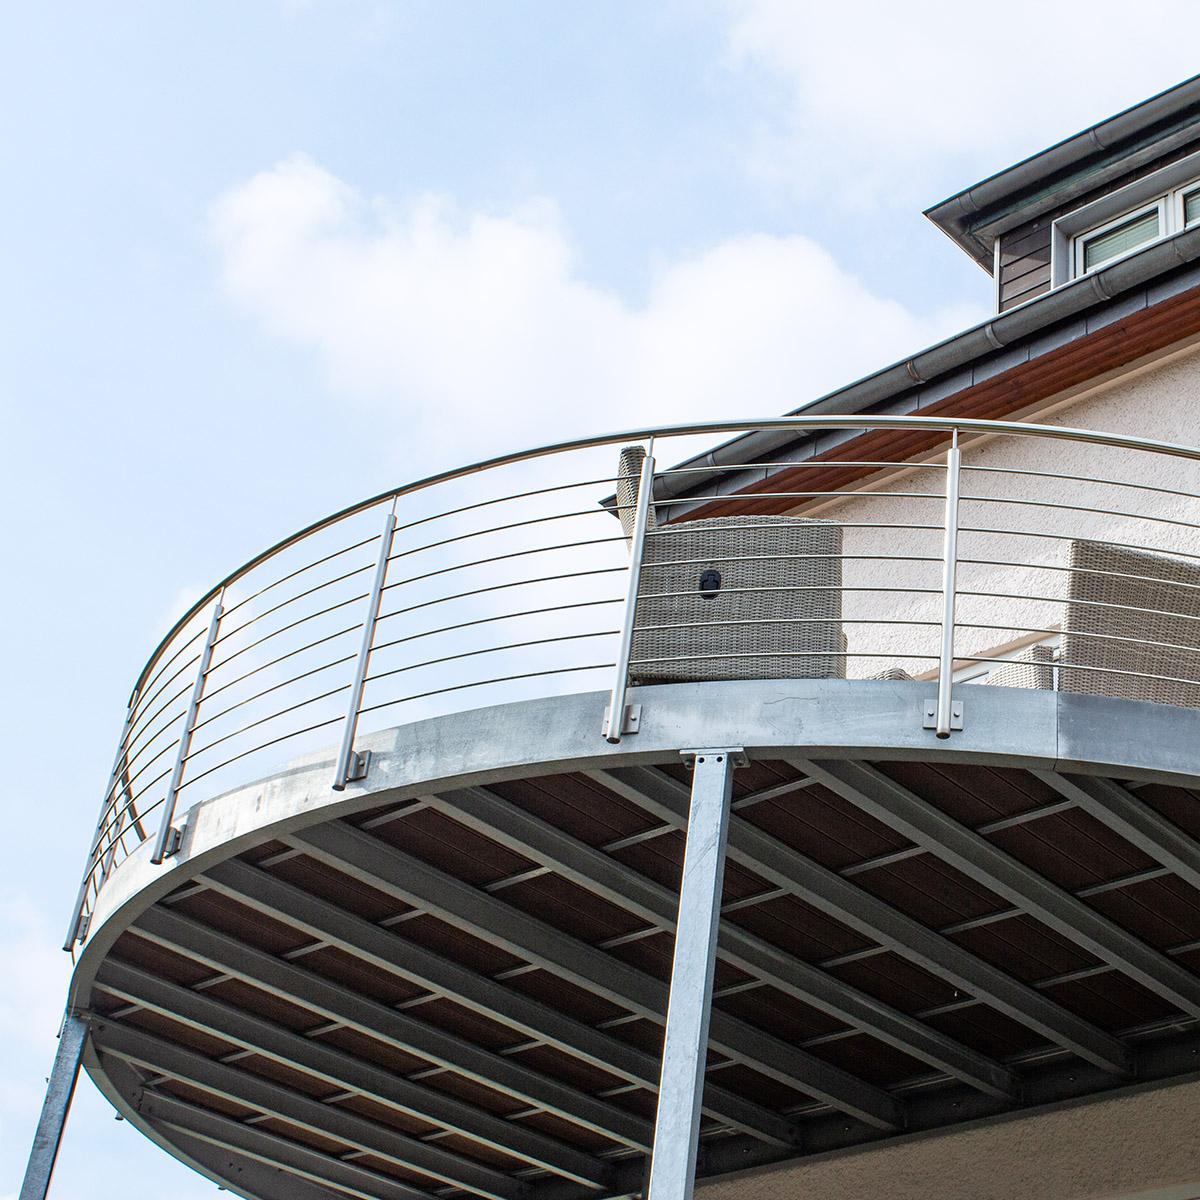 KS-Stahltechnik Referenz Balkon Unterkonstruktion